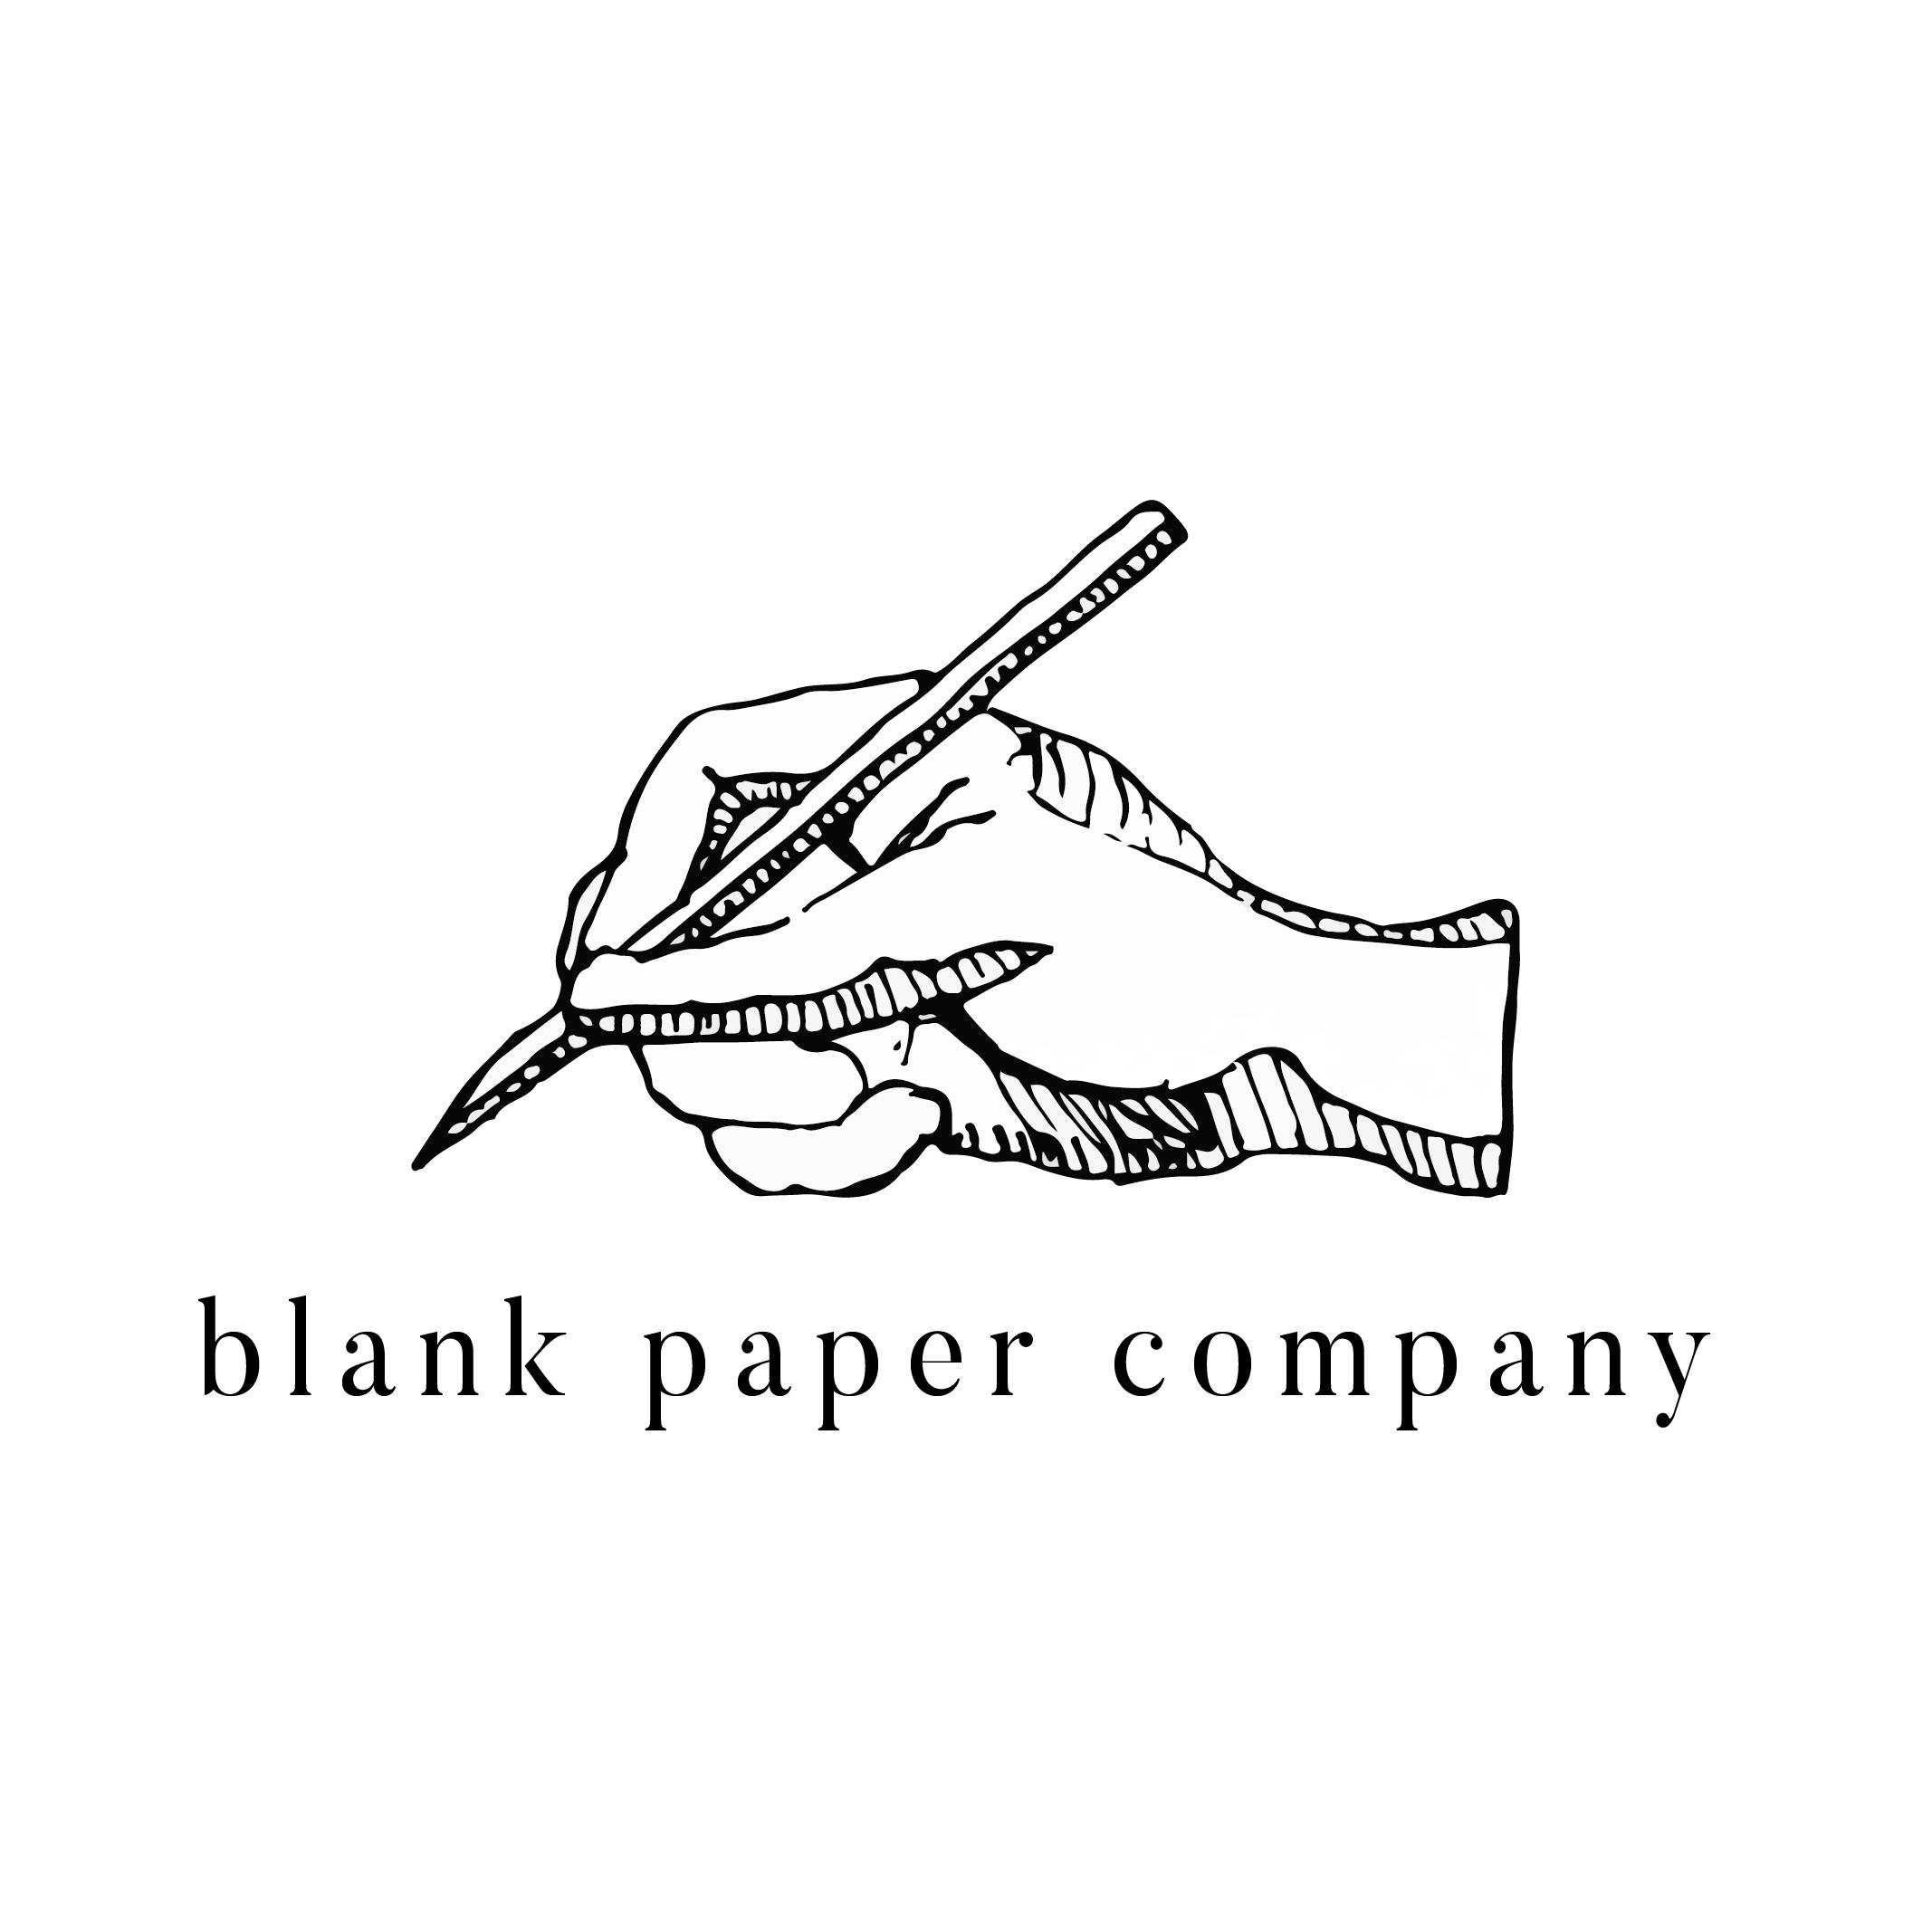 blank paper company画像